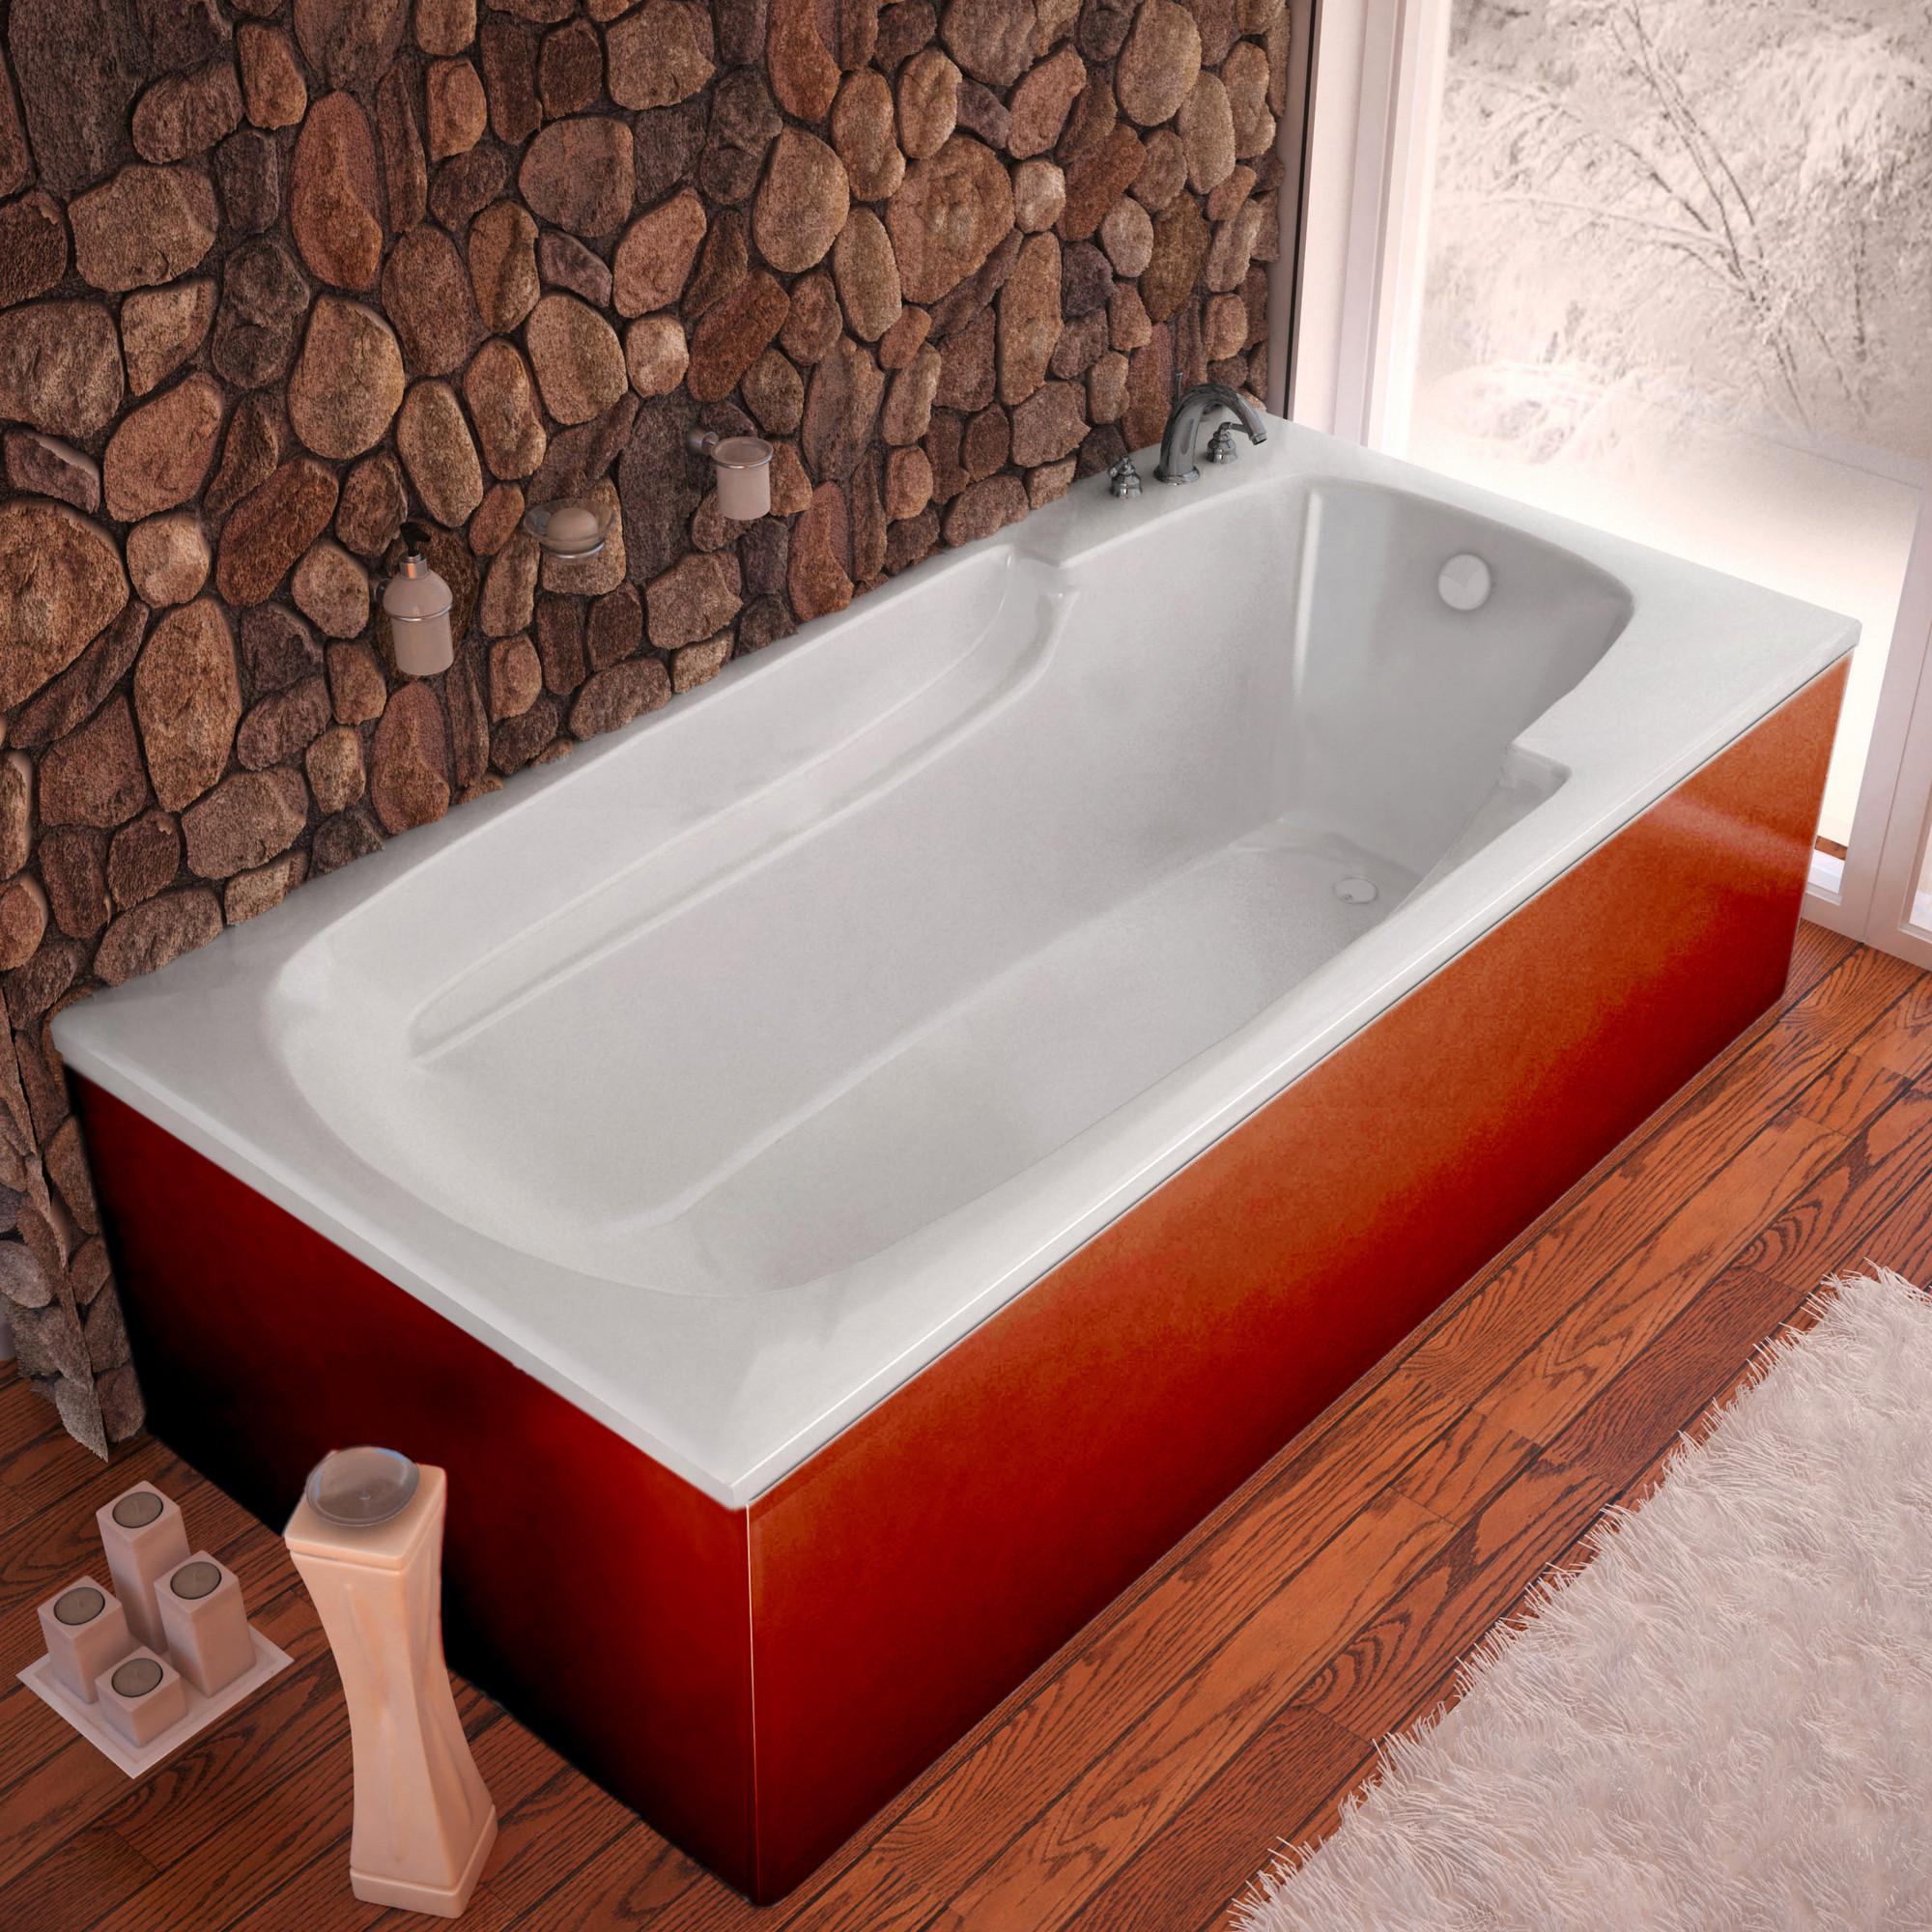 MediTub 4272E Atlantis Eros 42 x 72 Soaking Bathtub With Reversible Drain